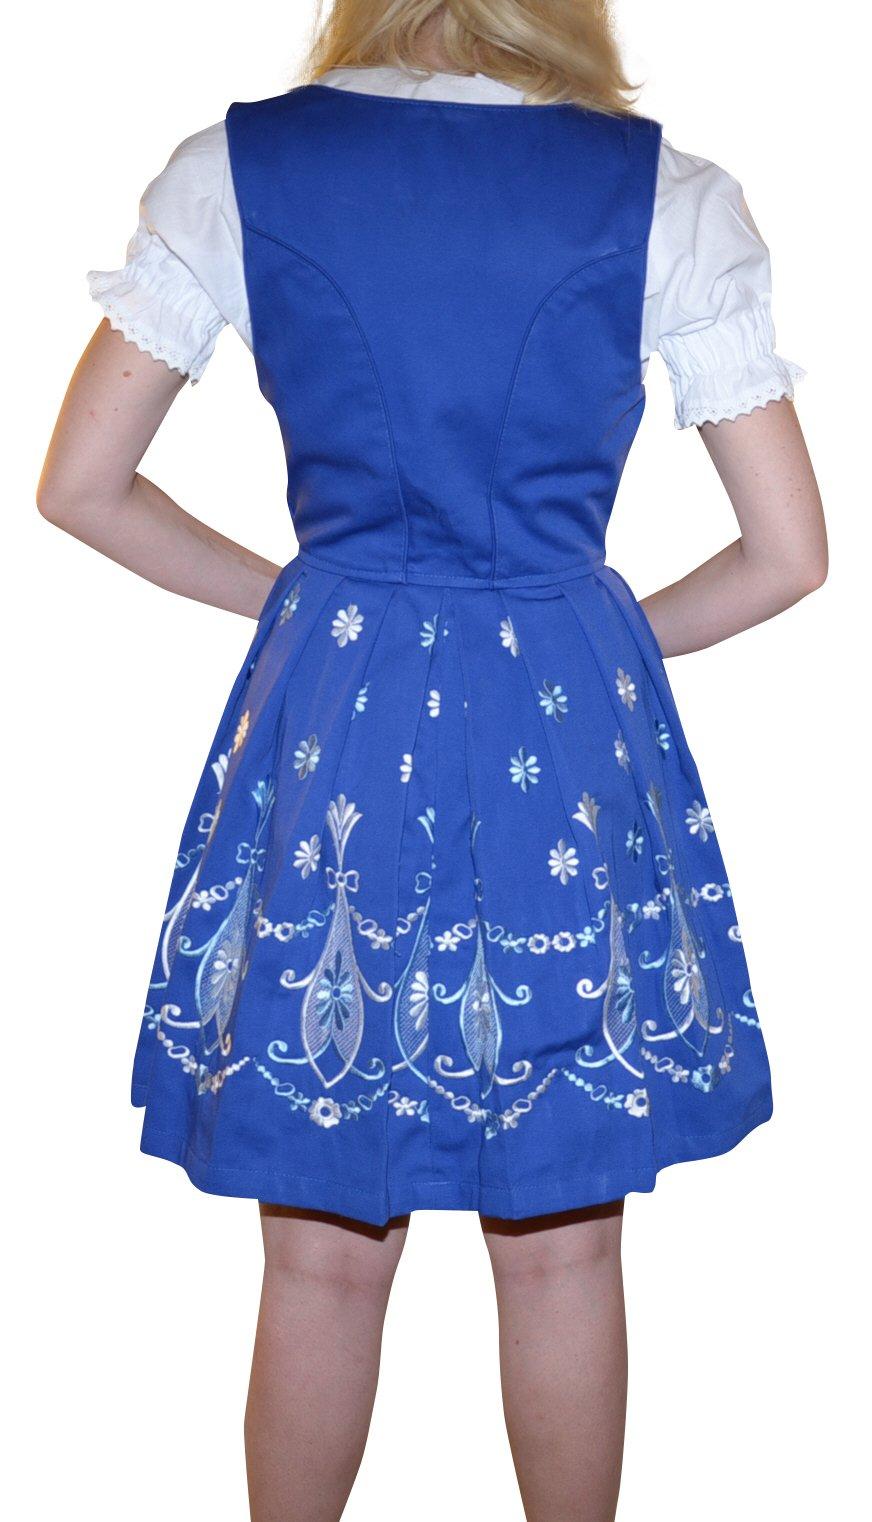 Dirndl Trachten Haus 3-piece Short German Wear Party Oktoberfest Waitress Dress 12 42 Blue by Dirndl Trachten Haus (Image #4)